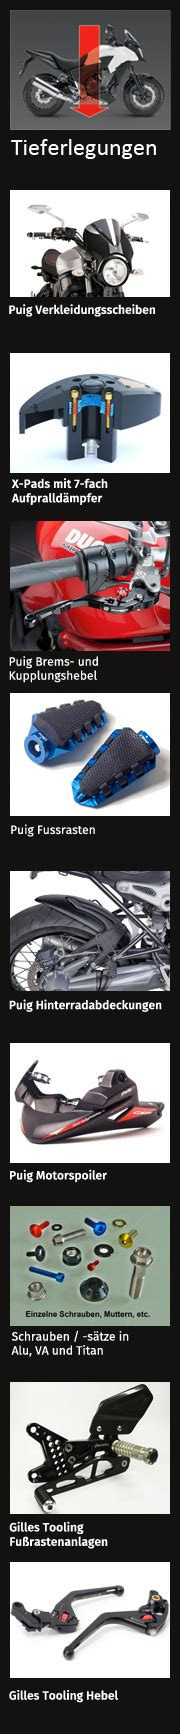 Motorrad Garage Gsm by Die Motorradgarage Genial Praktisch Top